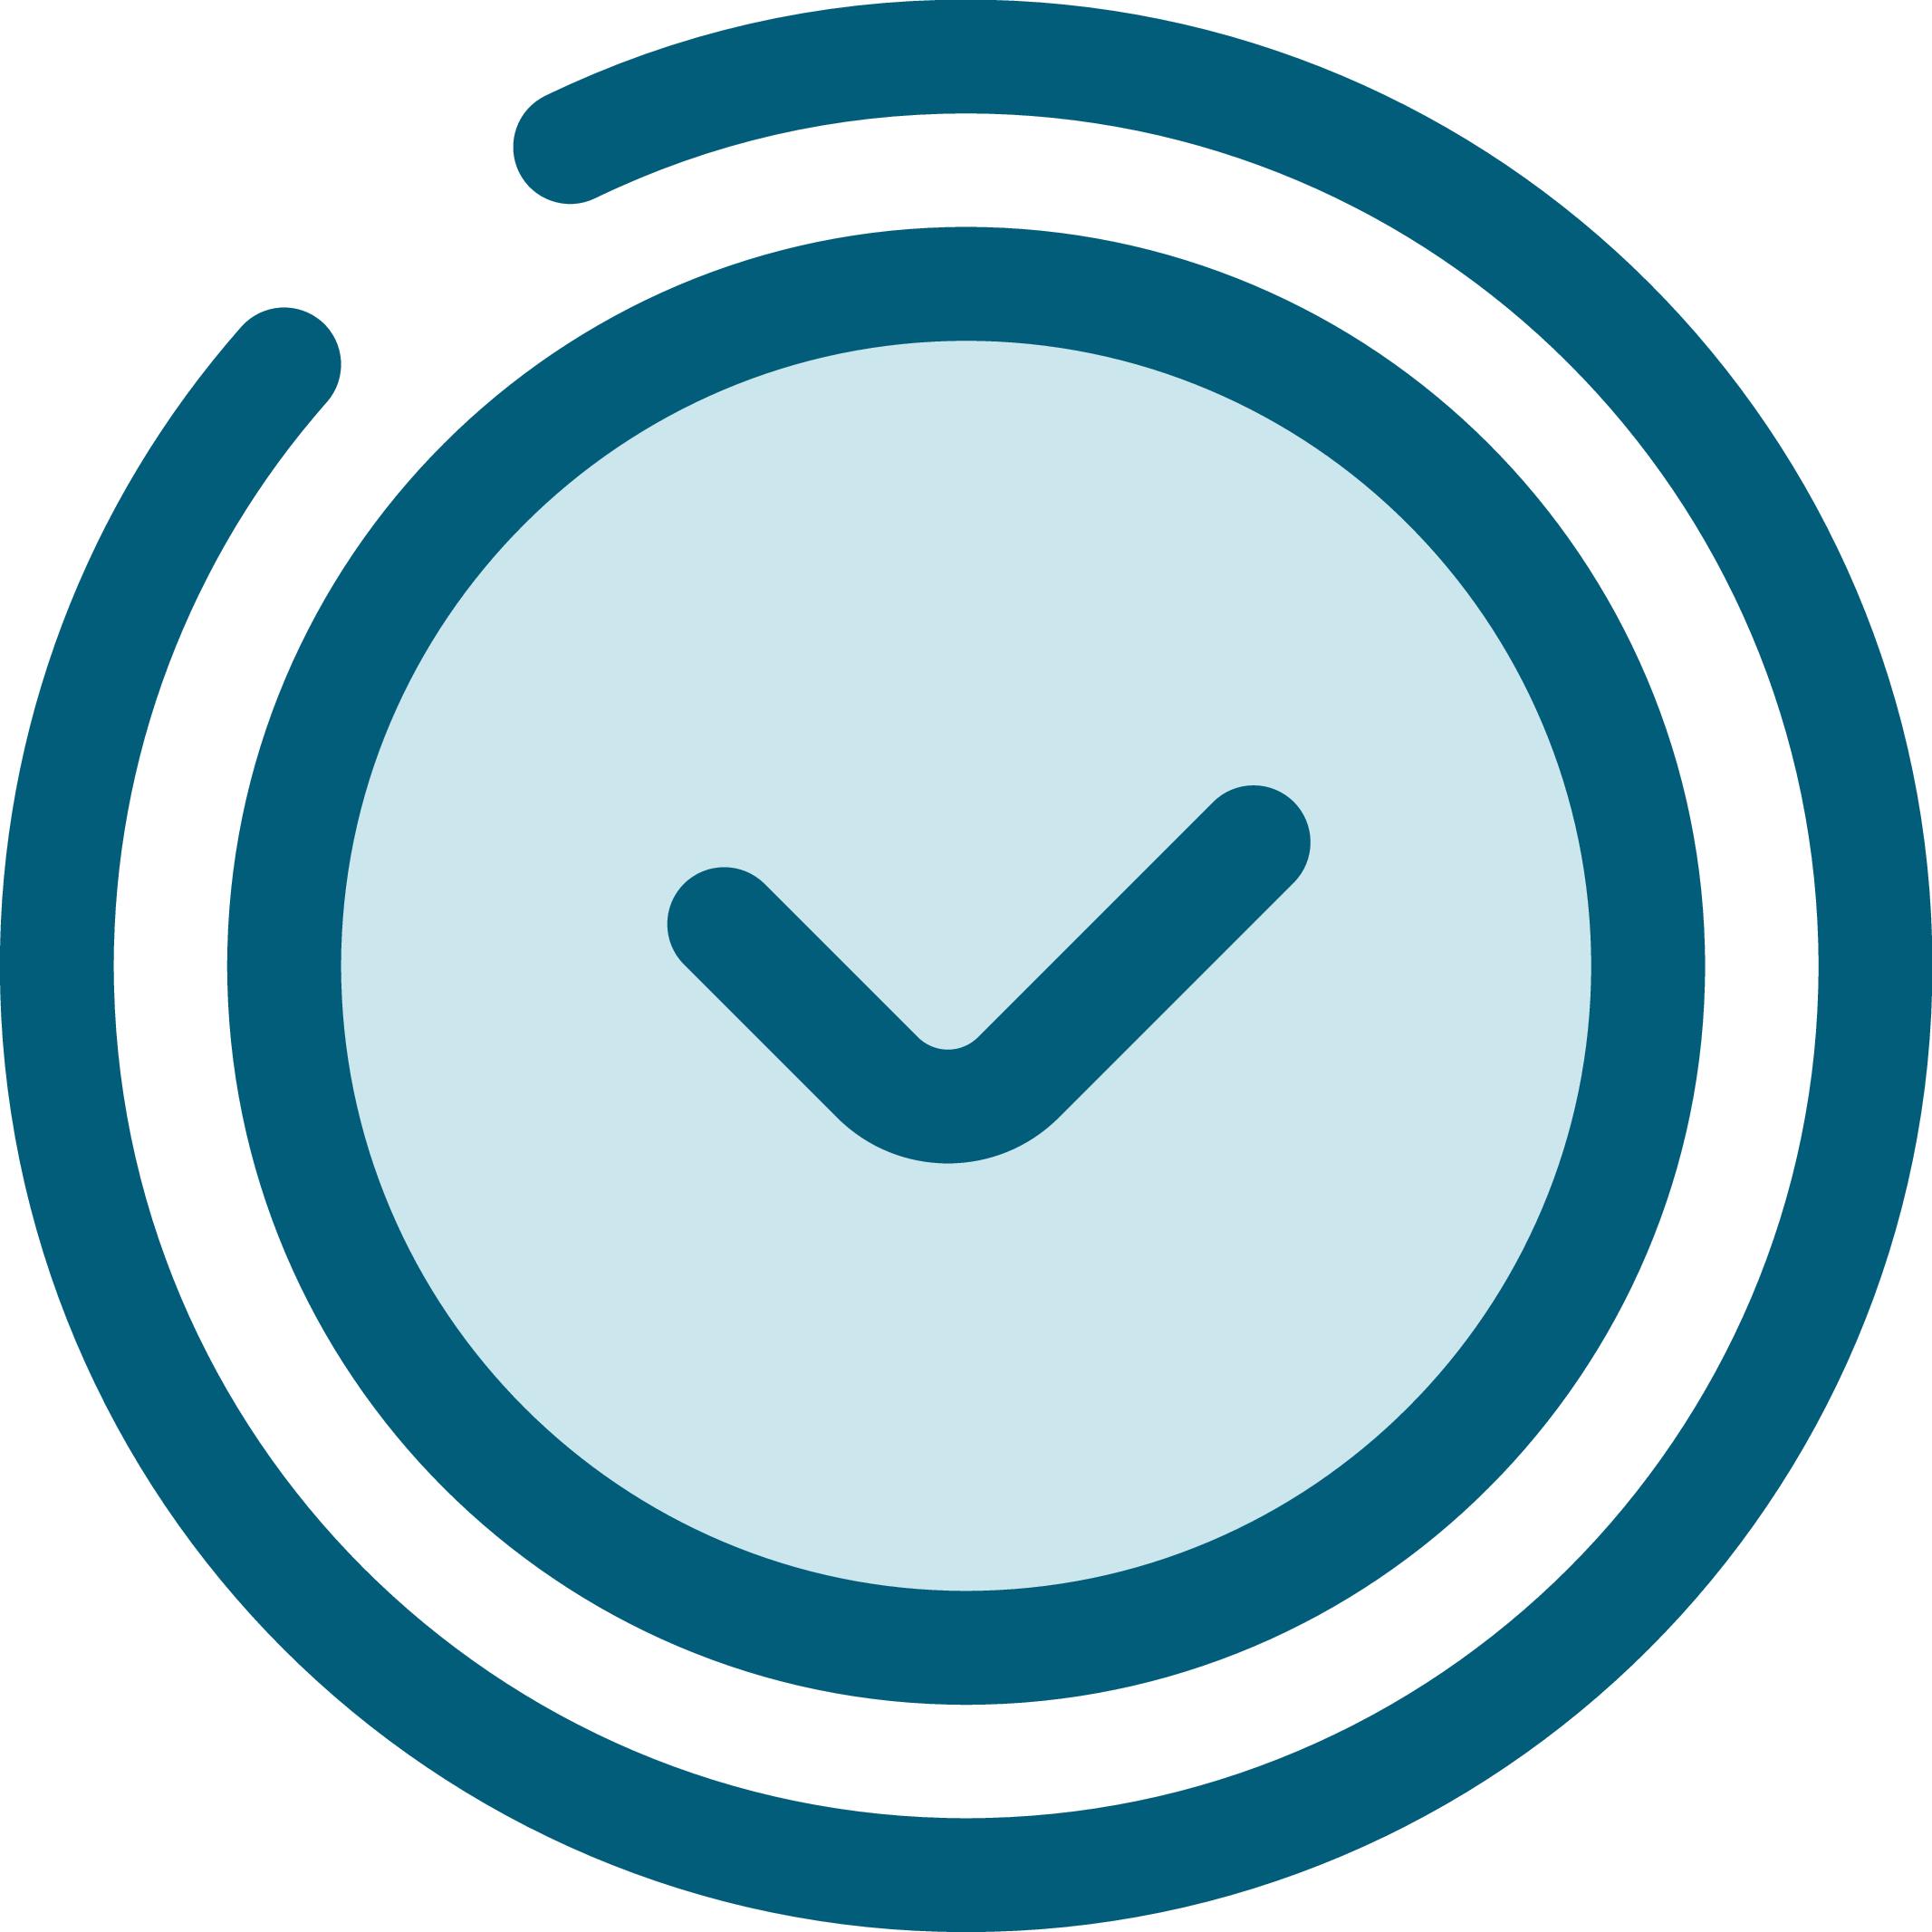 Premier Wealth Advisory Services round-clock